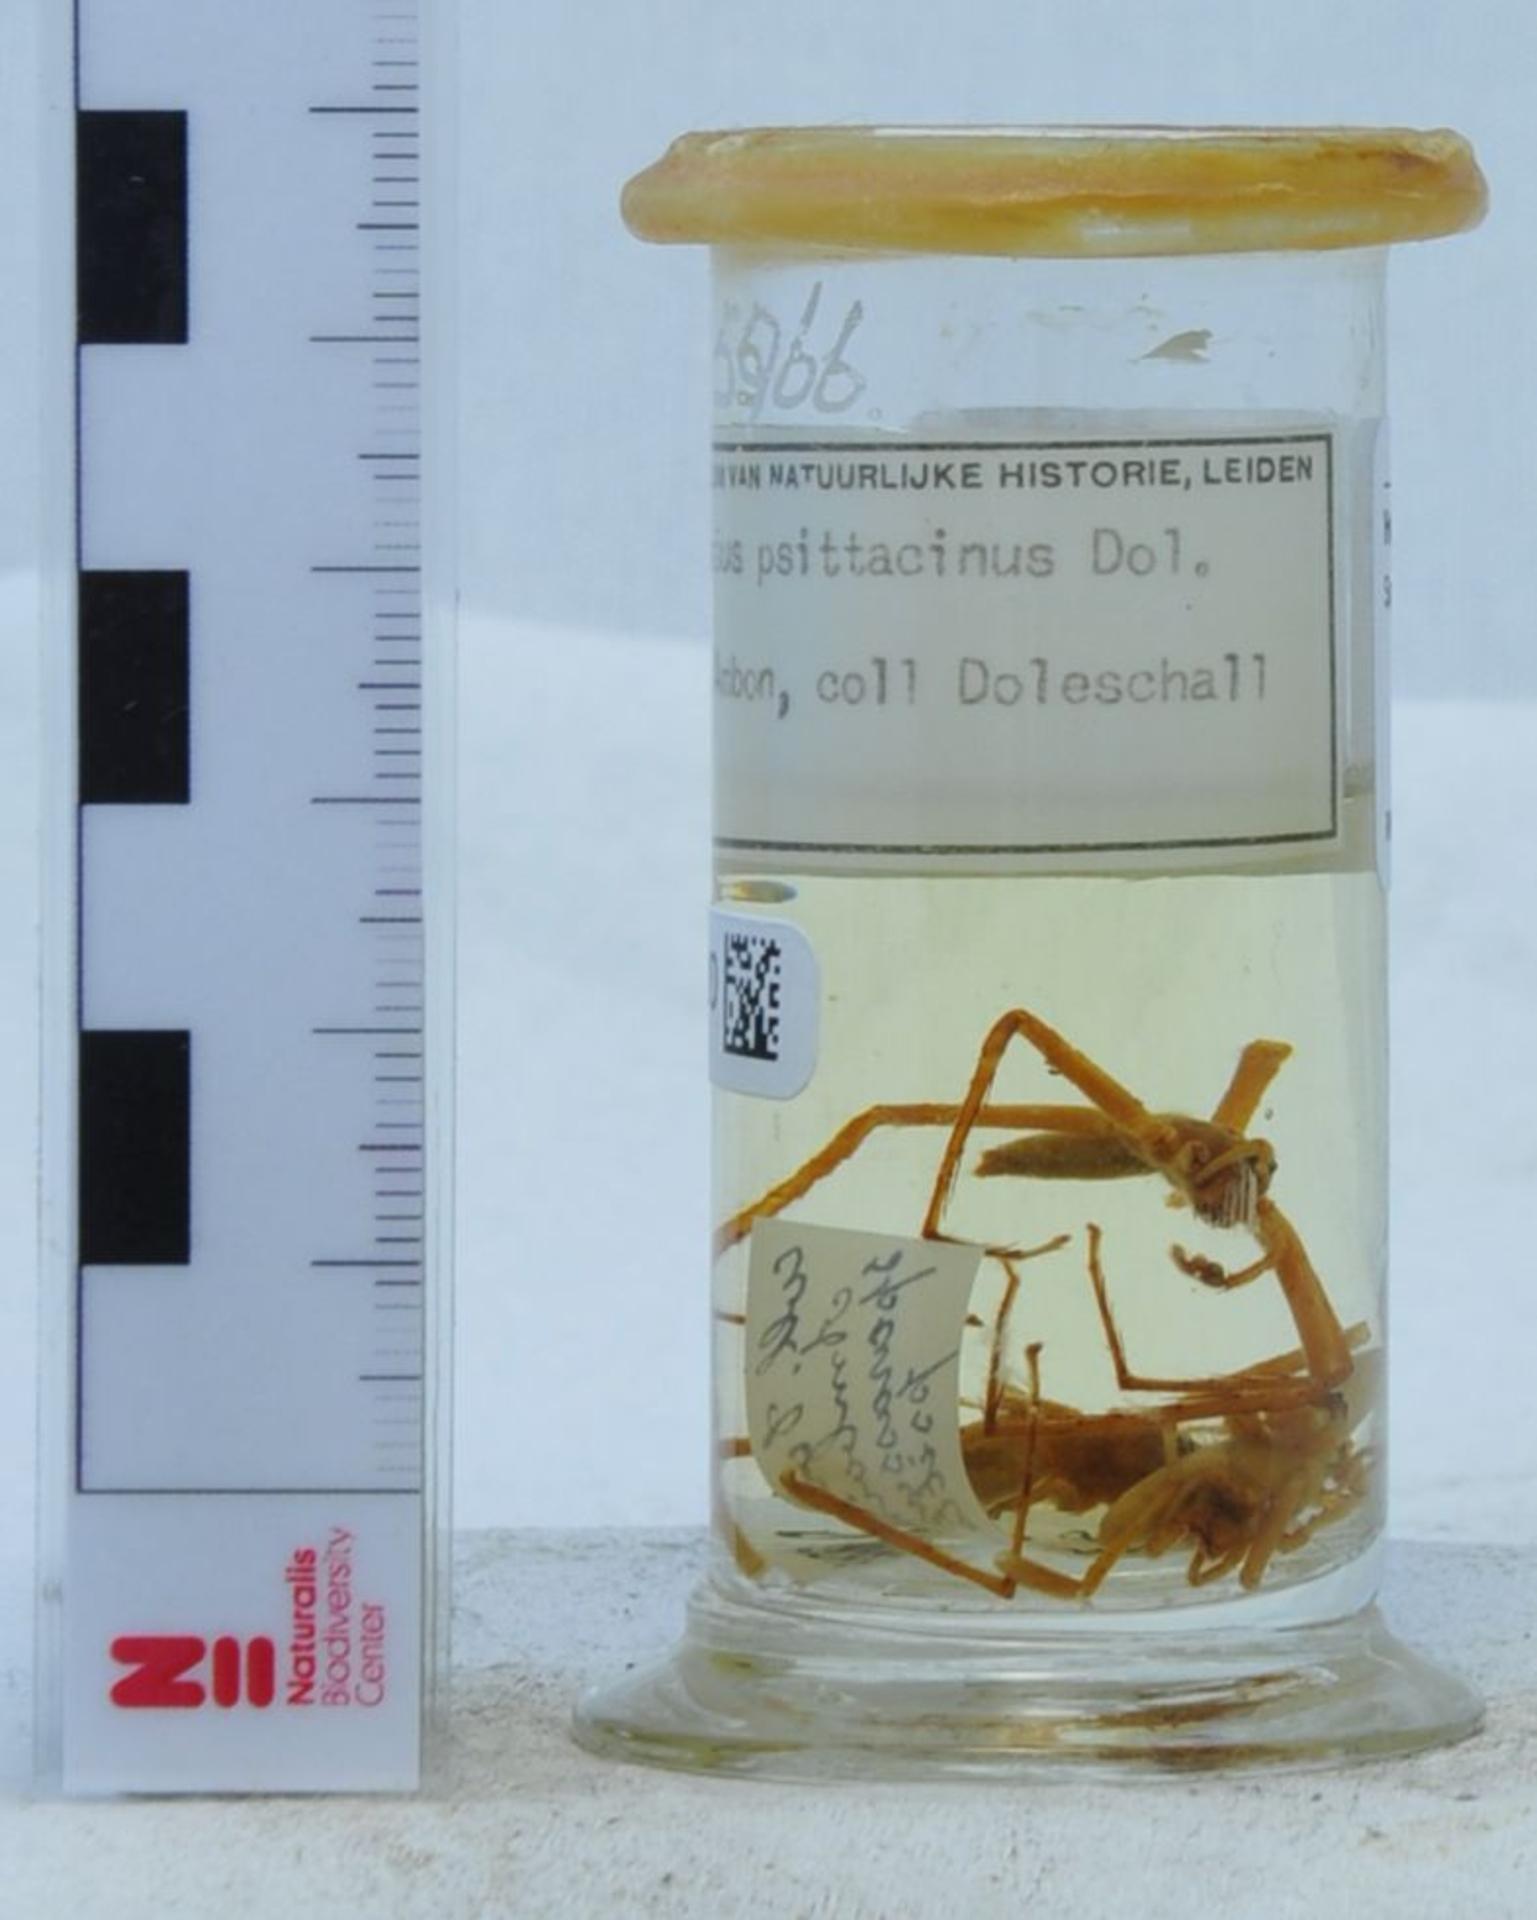 RMNH.ARA.5966   Sparassus psittacinus Doleschall, 1857